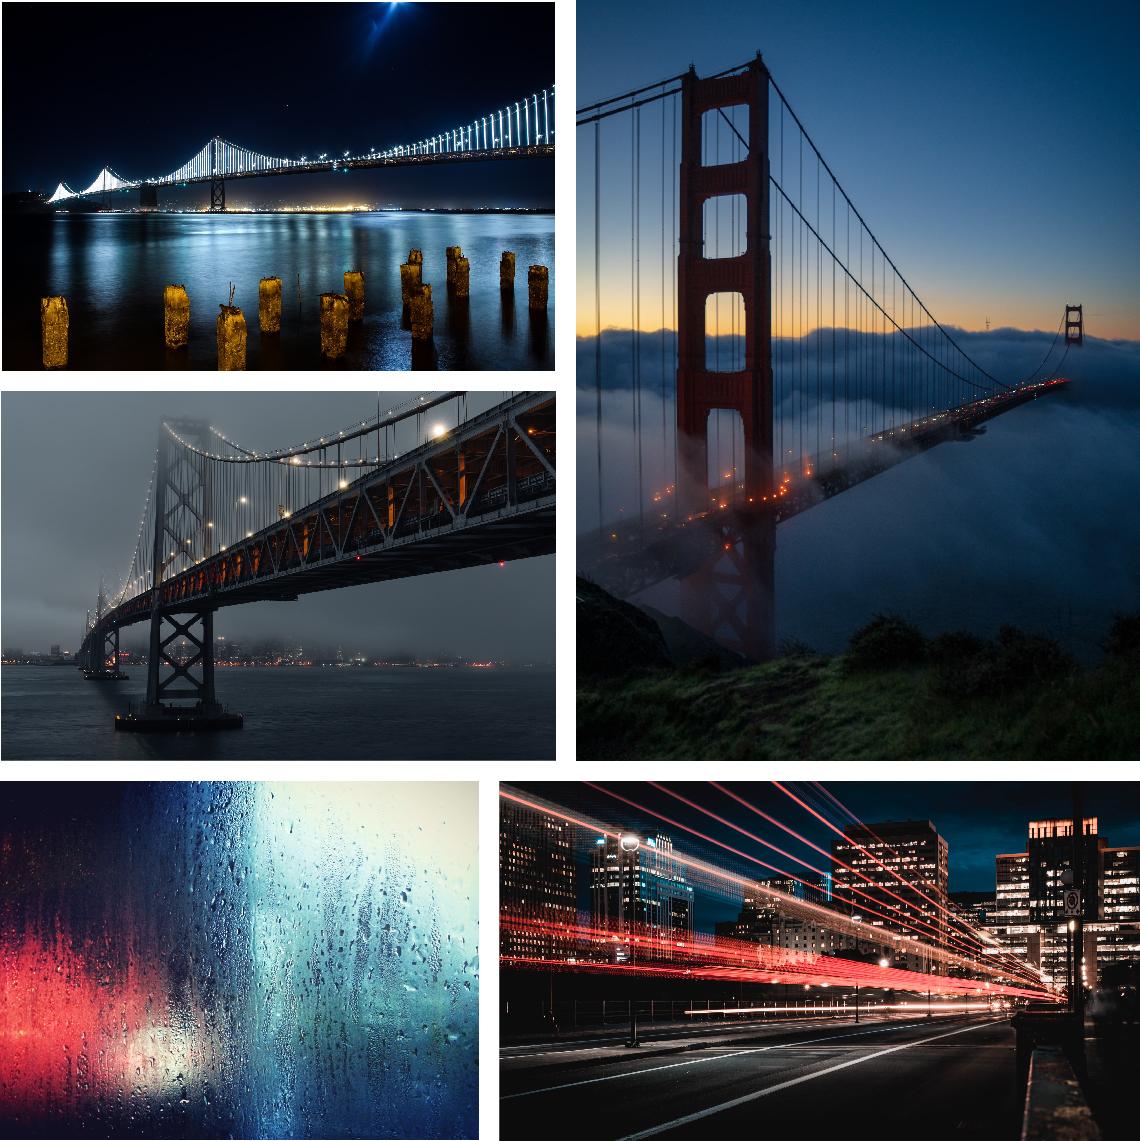 Bridge 3D Rendering: References